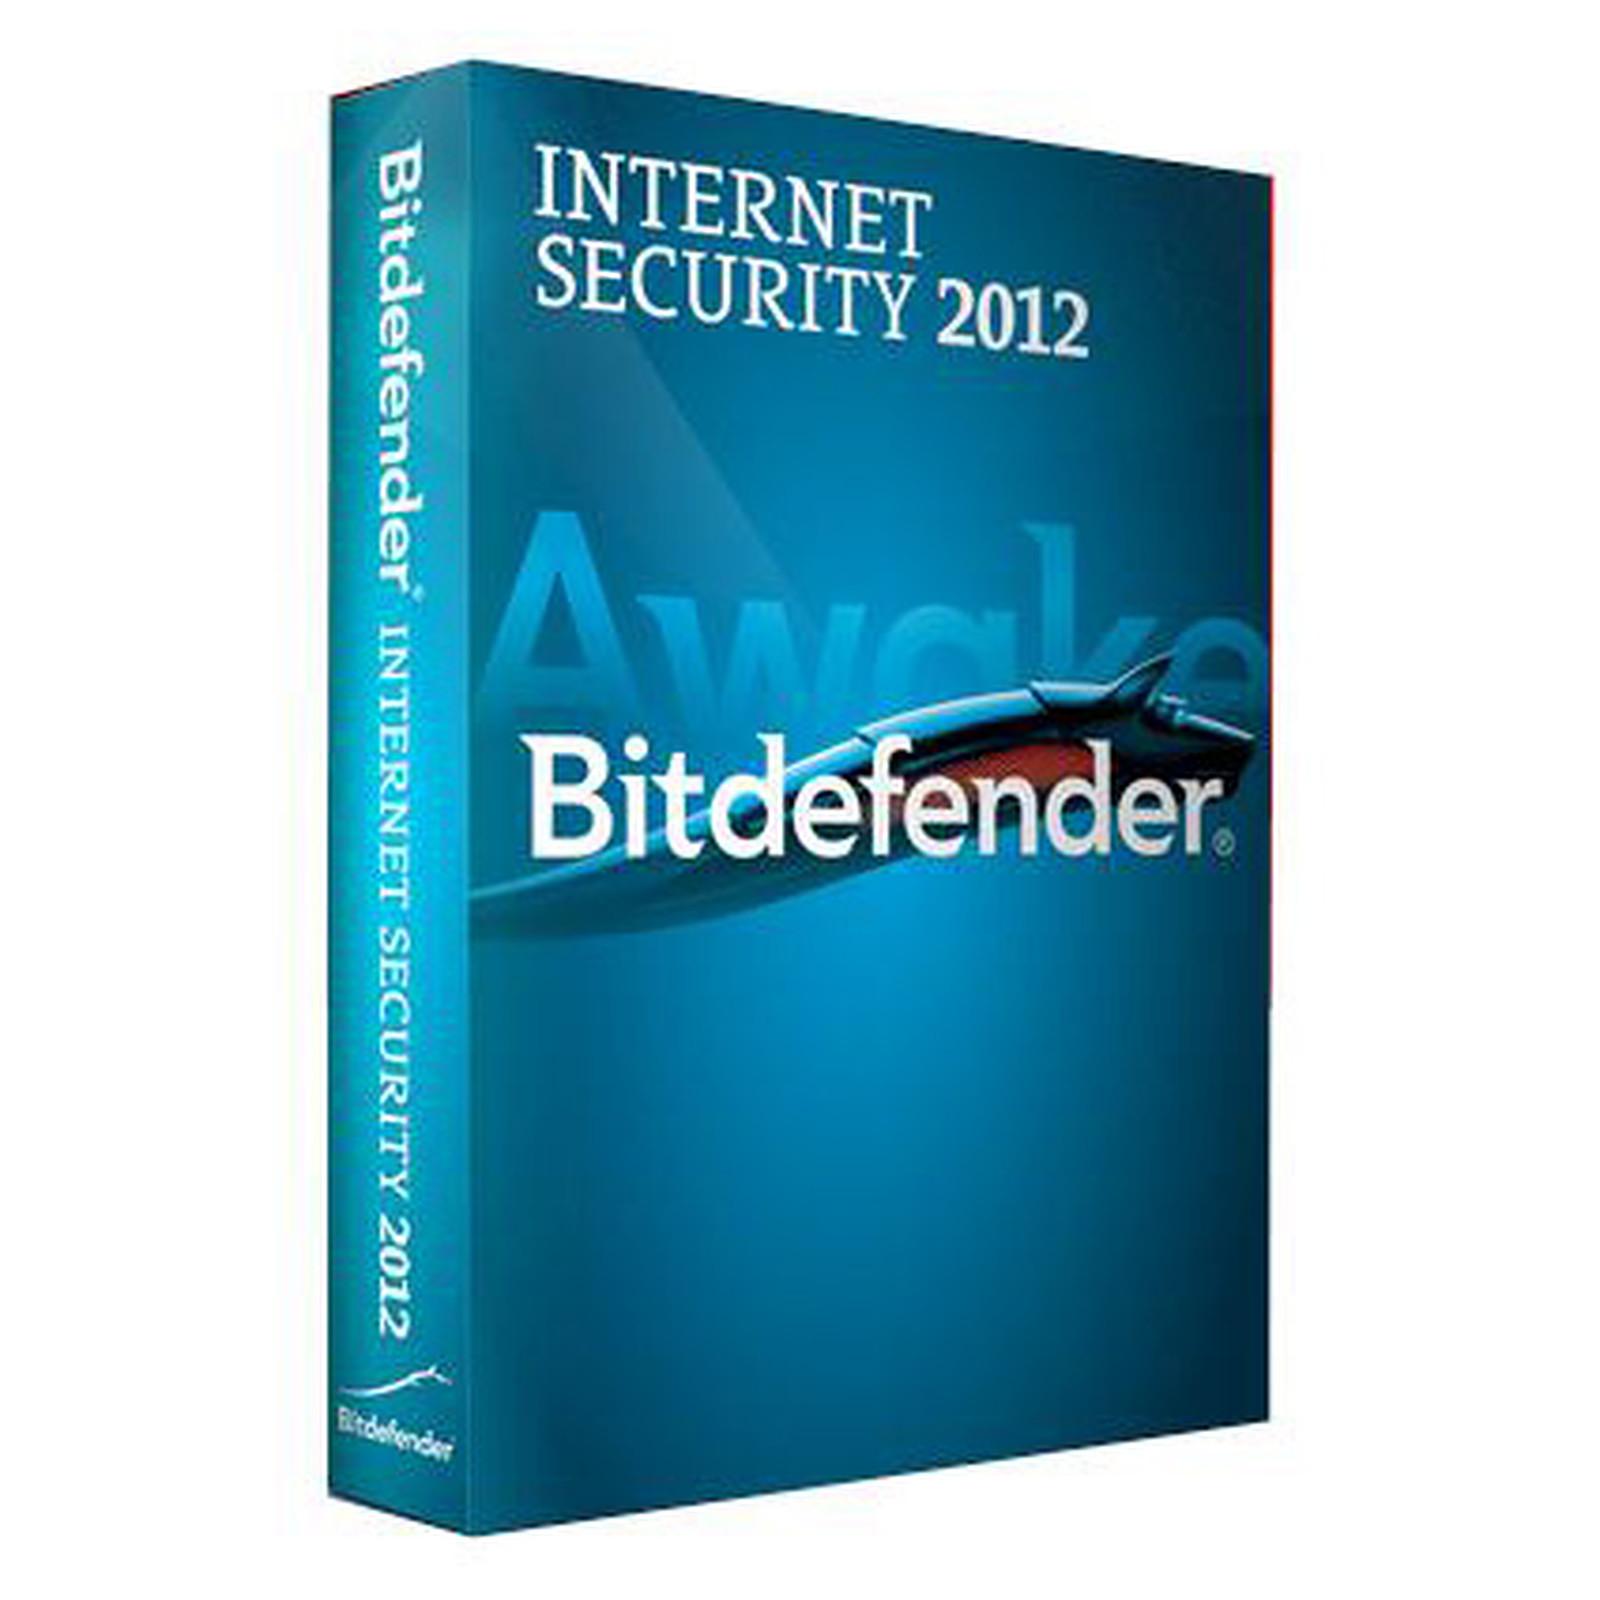 Bitdefender Internet Security 2012 - Licence 1 an 25 postes